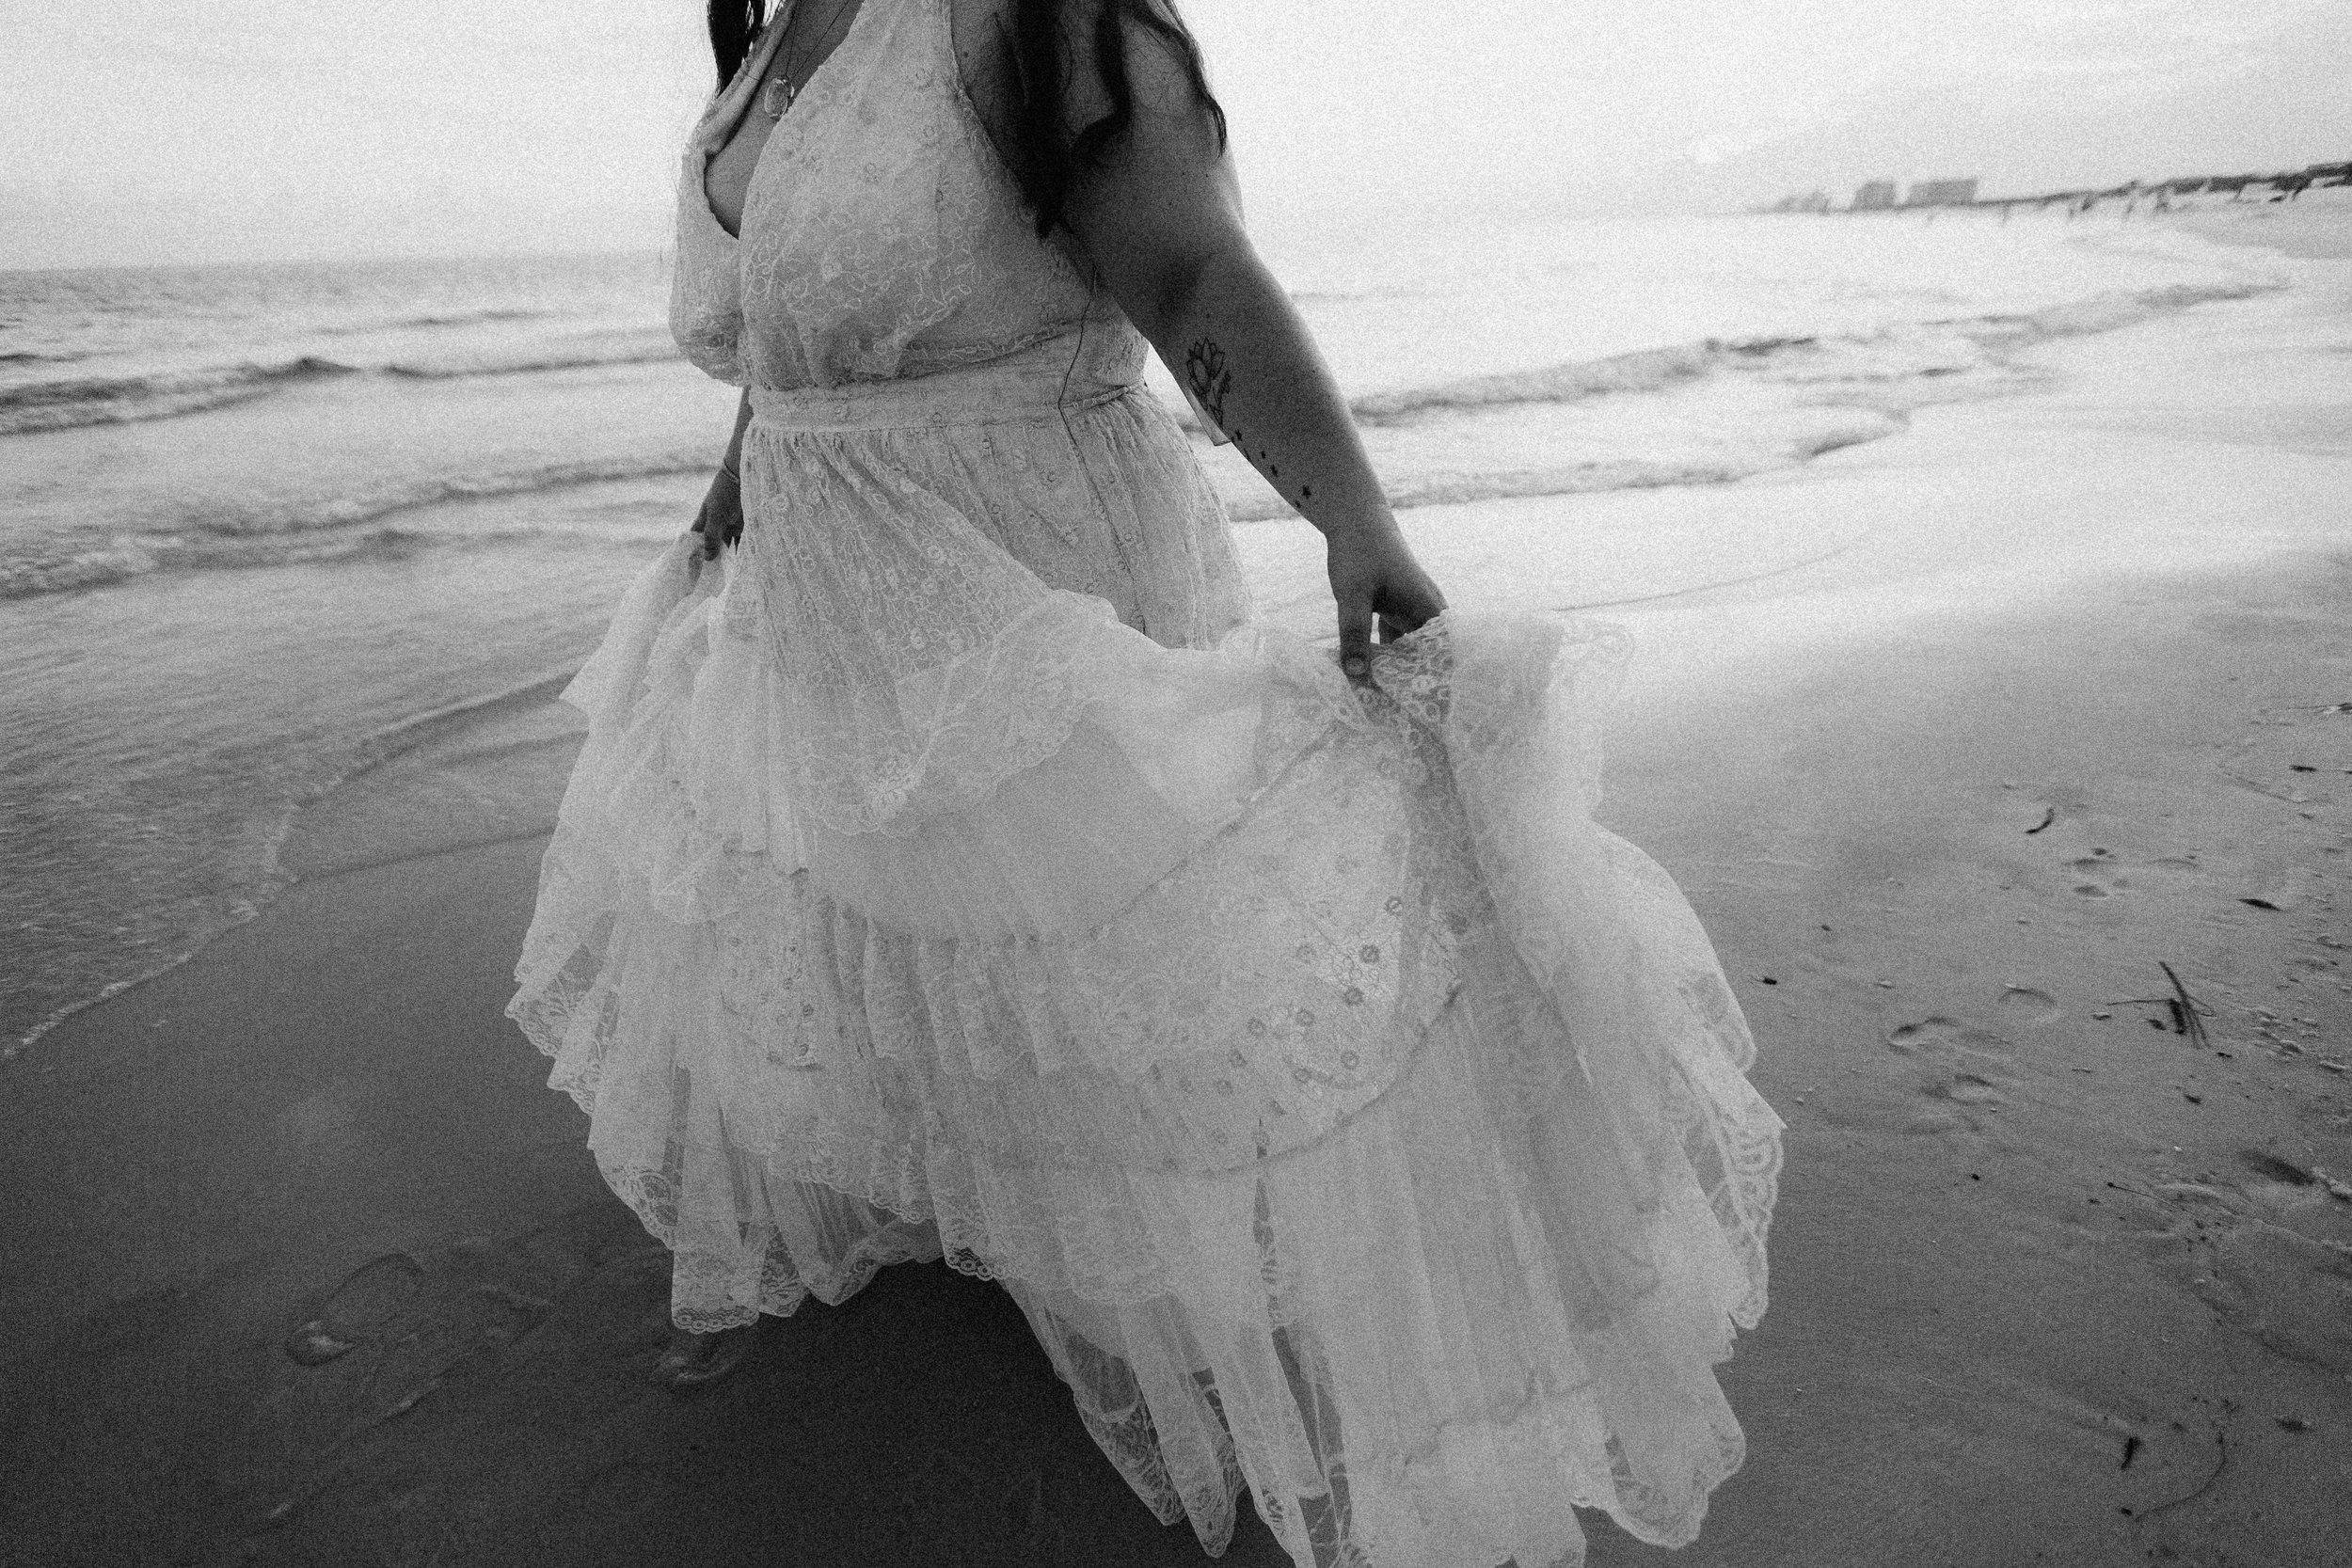 destin_sunset_beach_elopement_intimate_wedding_photographer_florida_documentary_1323.jpg